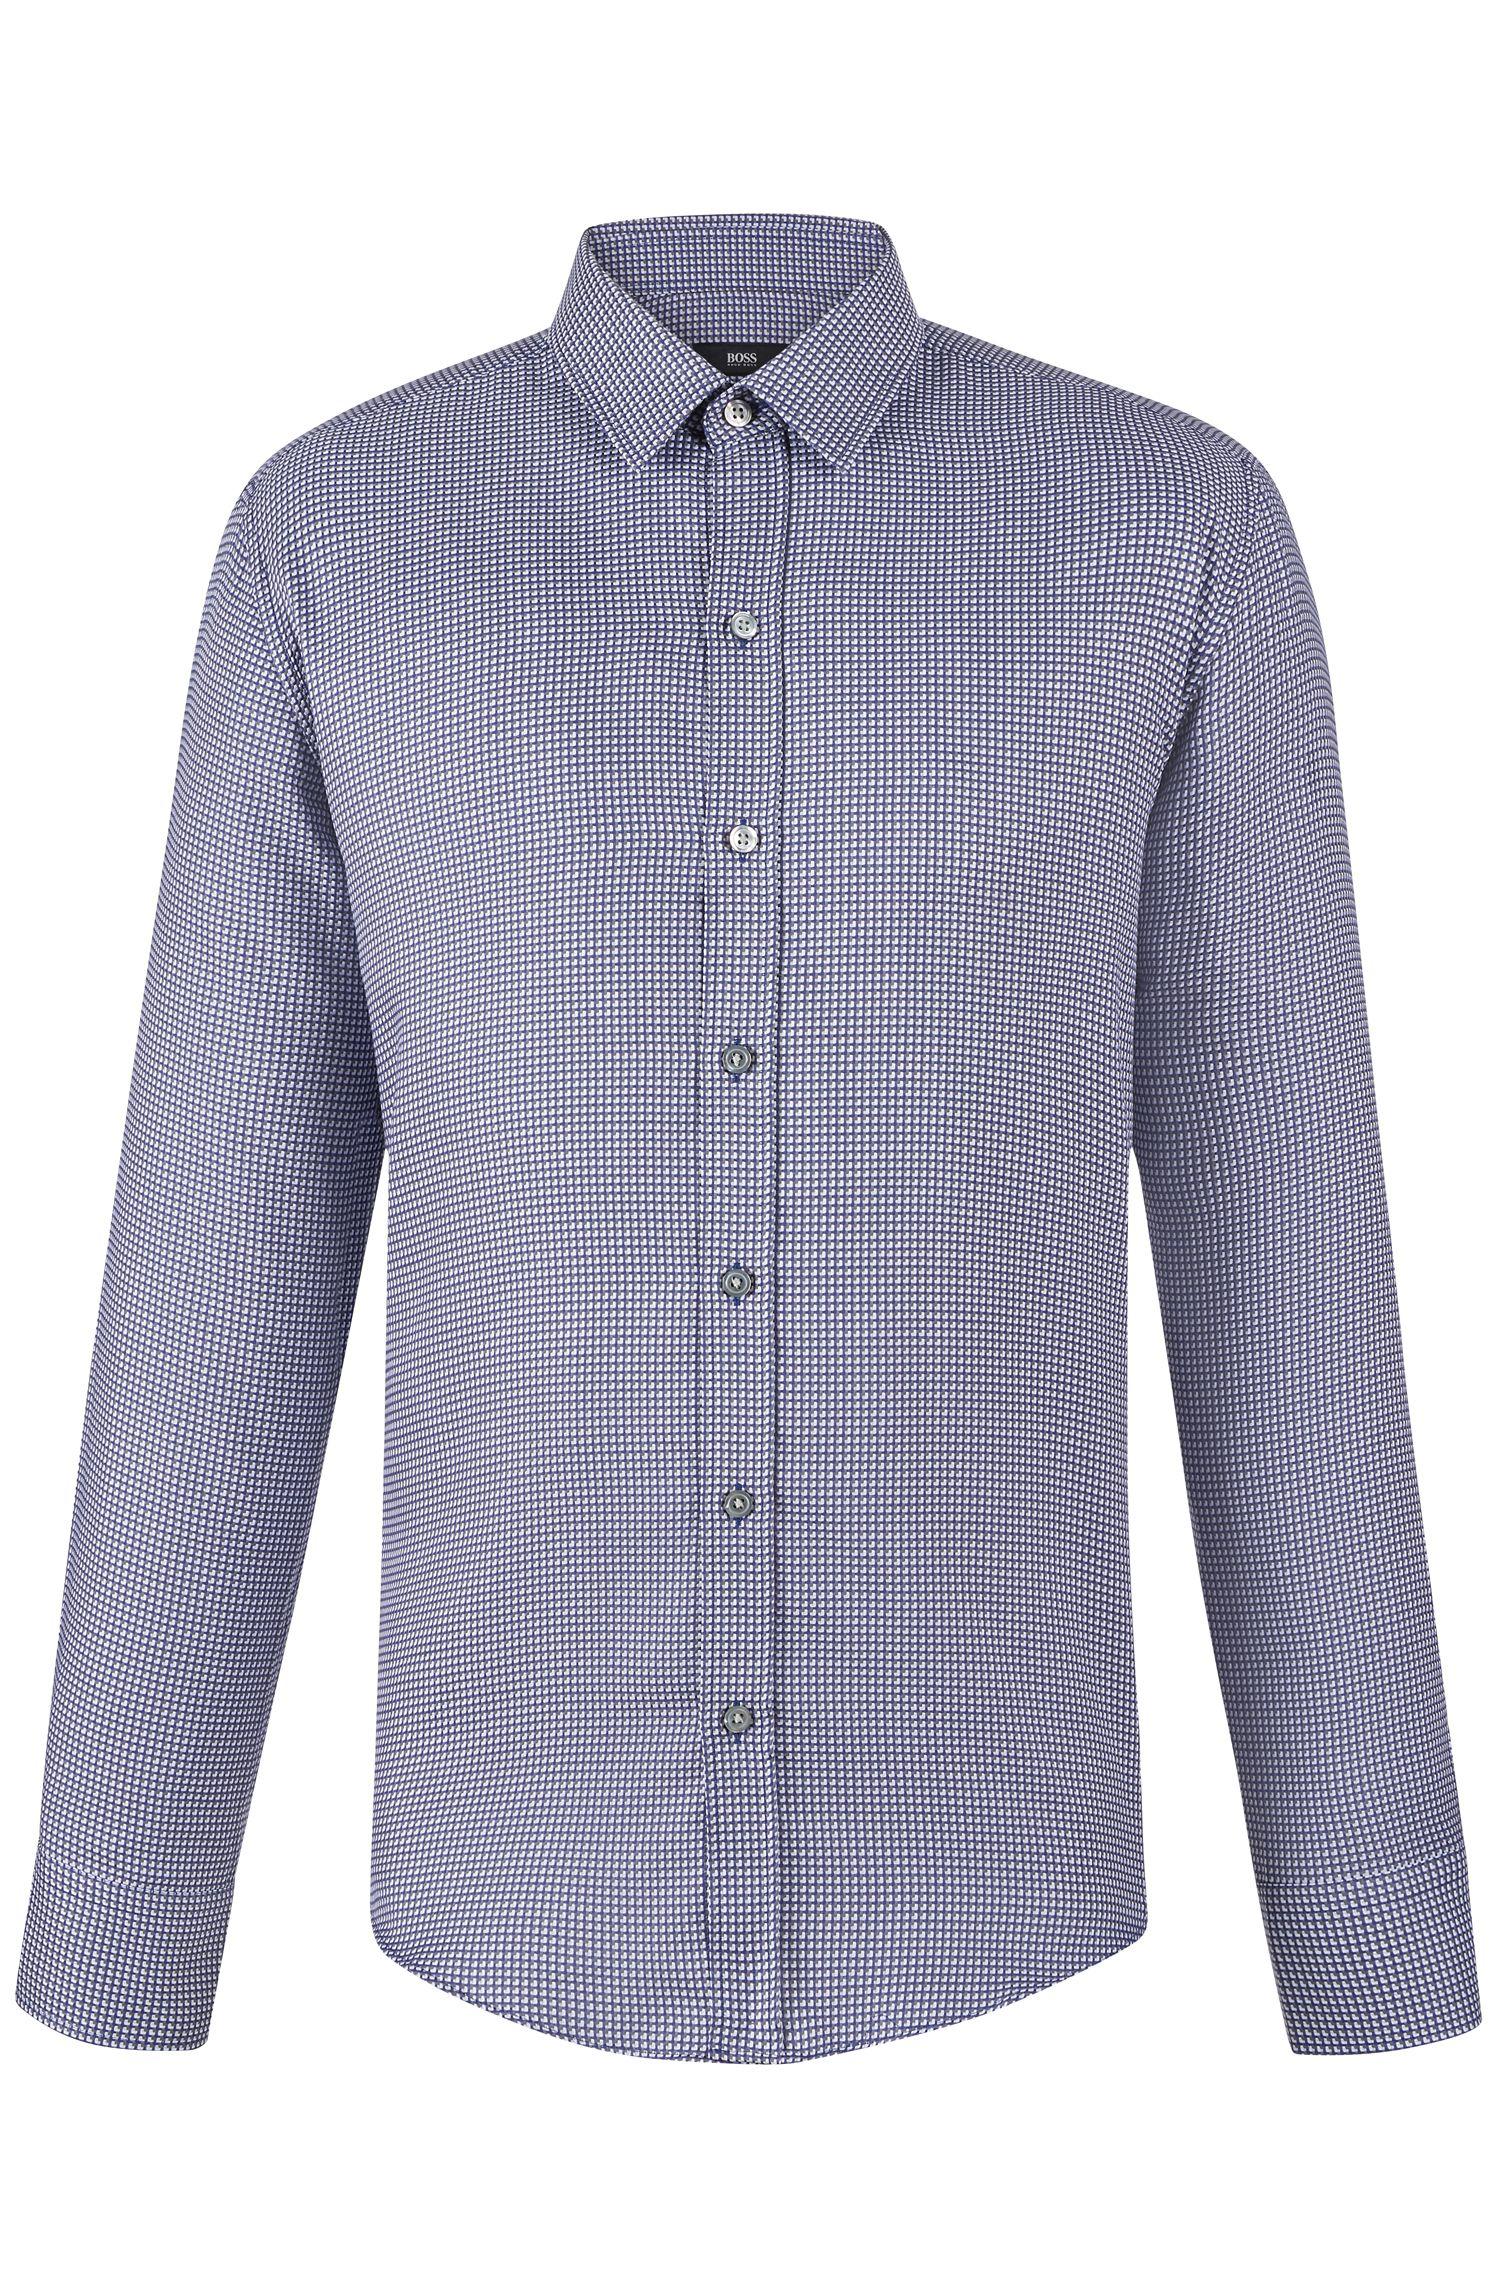 'Robbie'   Slim Fit, Cotton Button Down Shirt